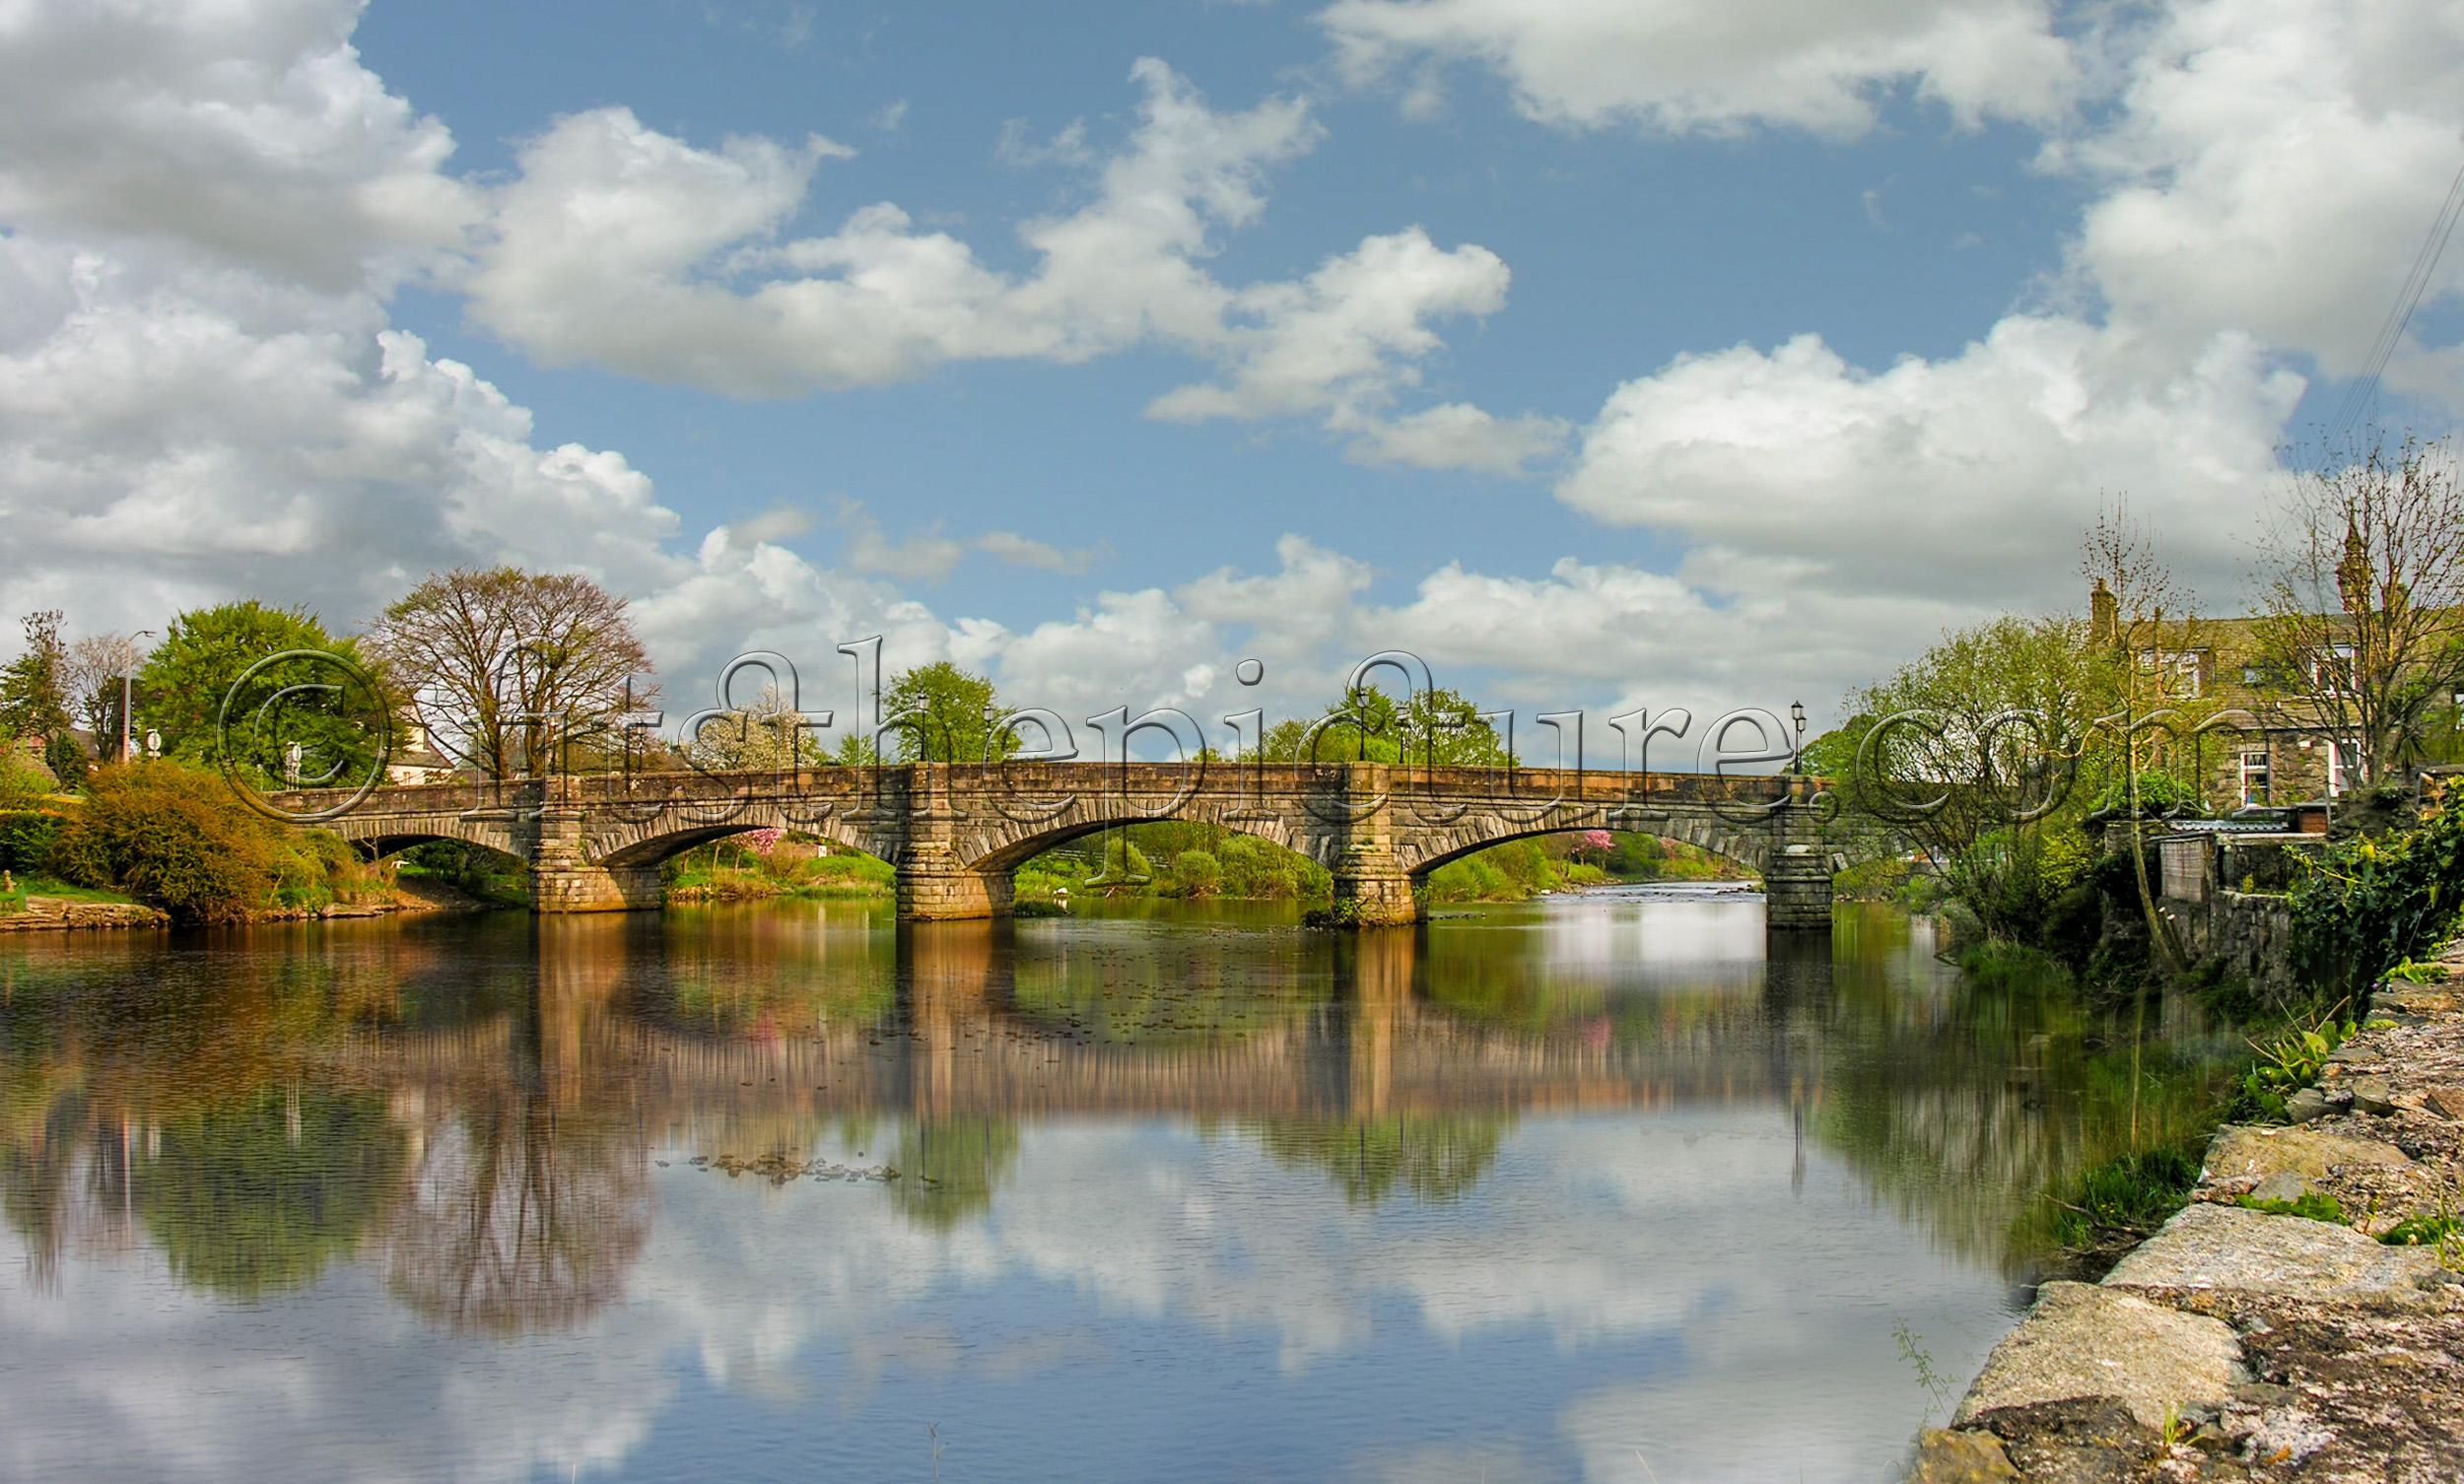 The Creebridge afternoon